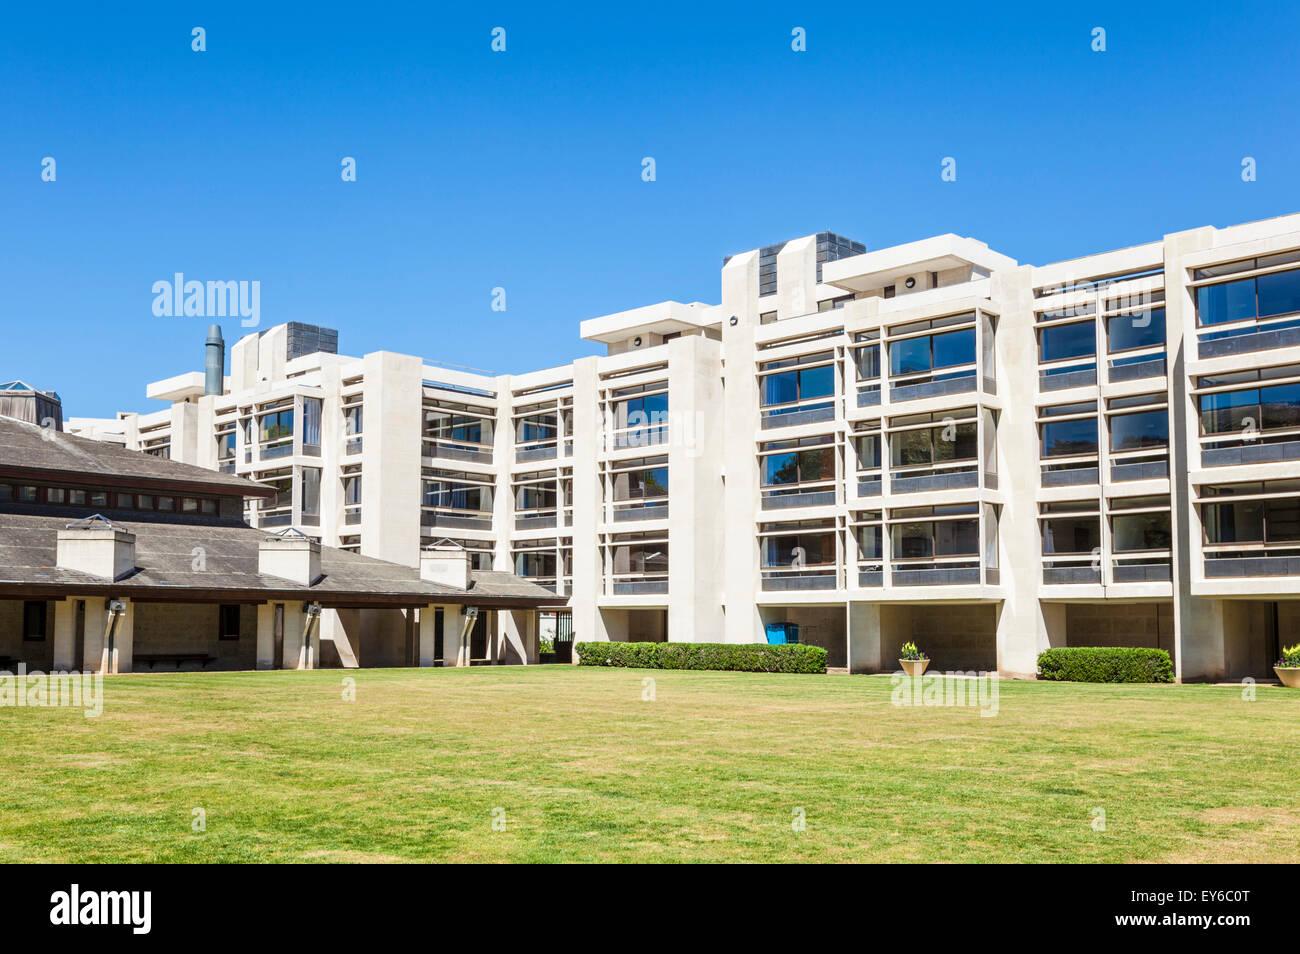 The Cripps Building St Johns college Cambridge university Cambridge Cambridgeshire England UK GB EU Europe - Stock Image